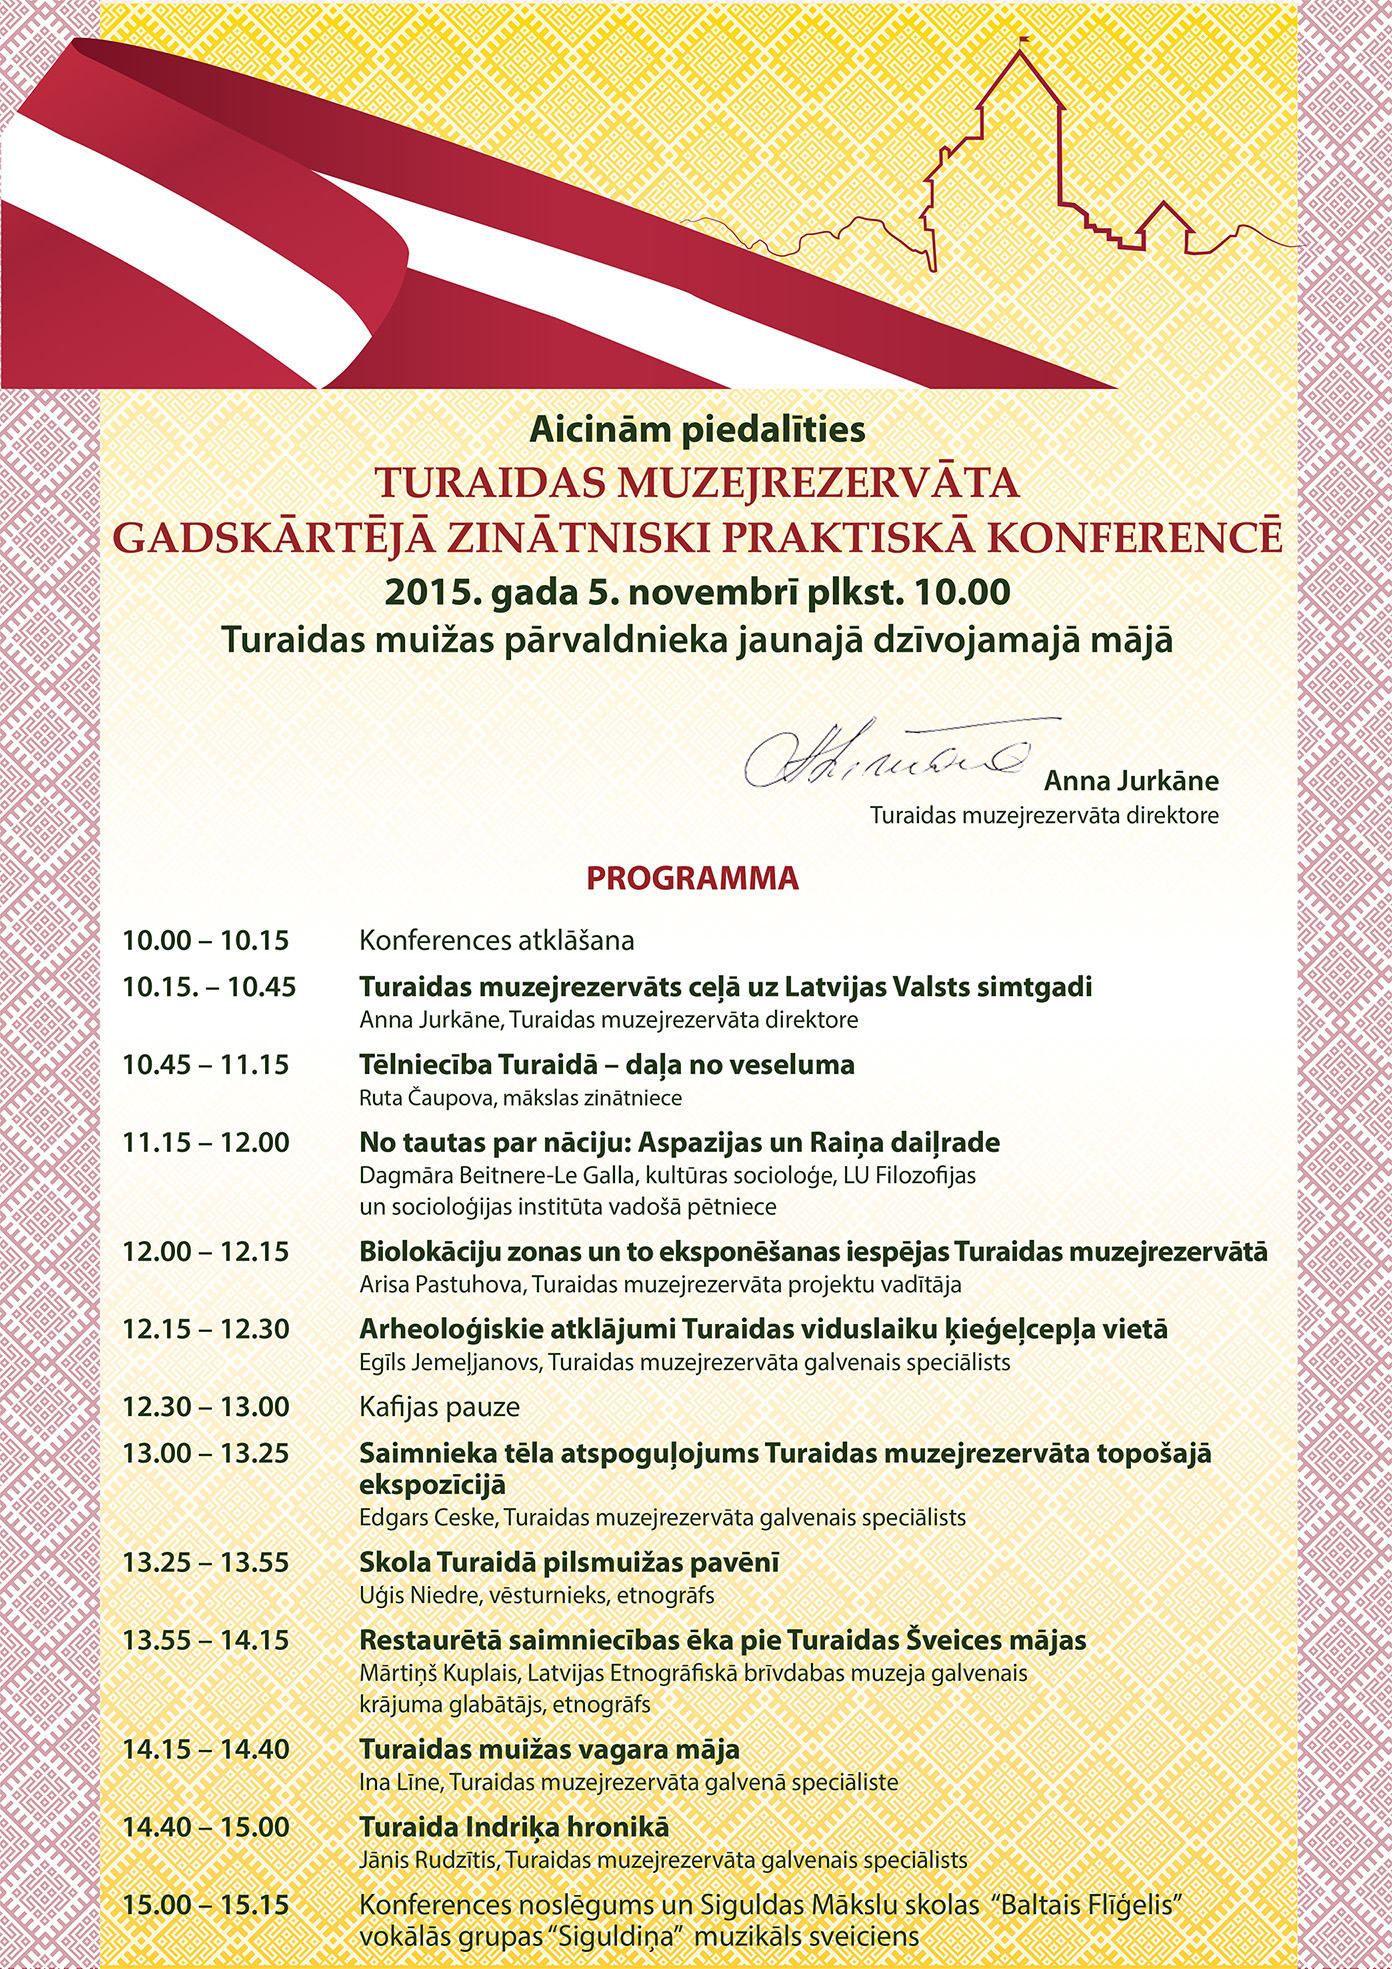 ZPkonferences_Eieluugums